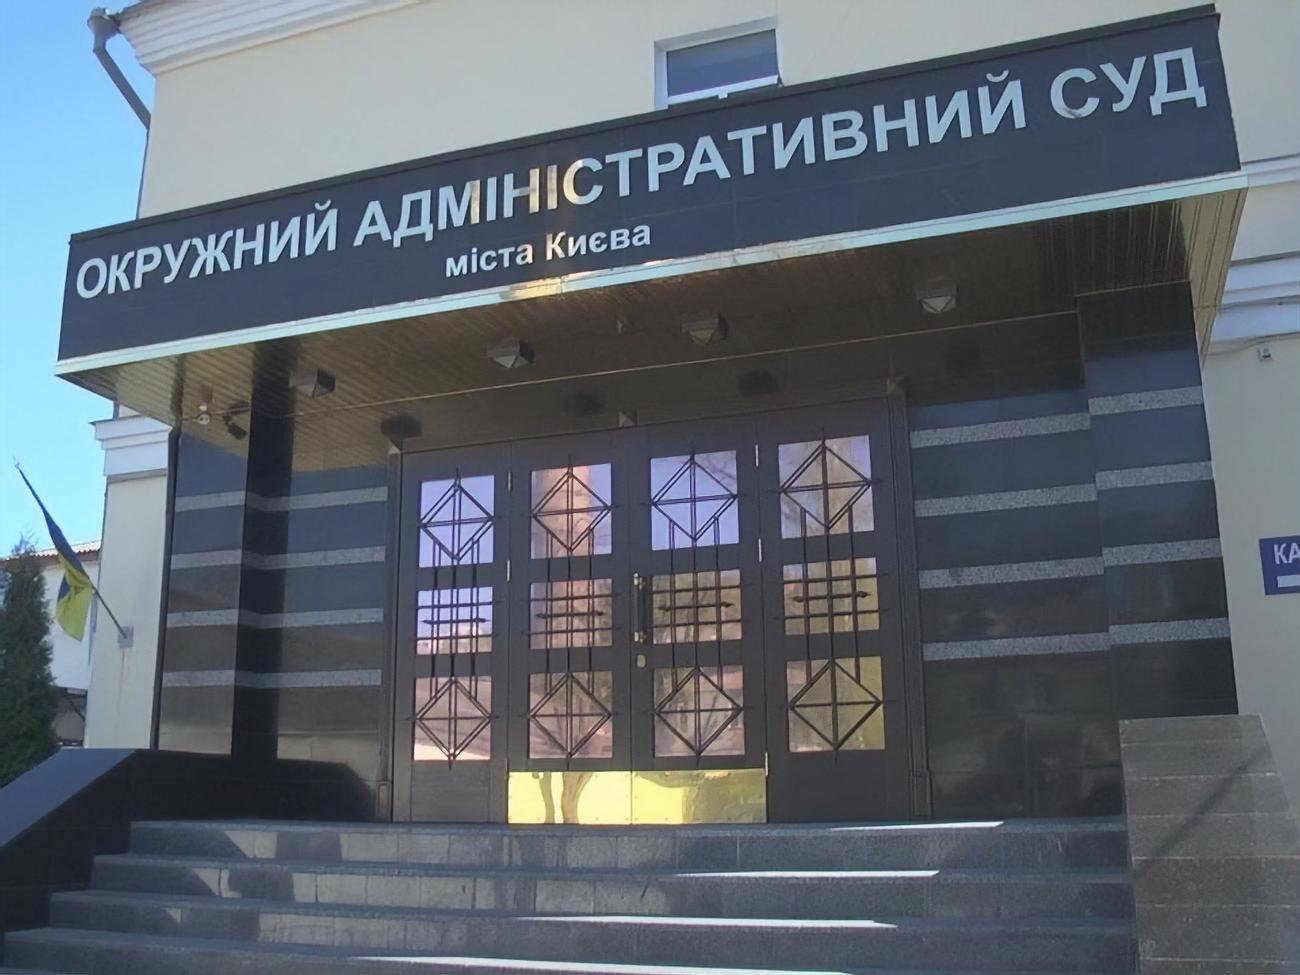 Екс-глава представництва ЄБРР в Україні Шевки Аджунер подав позов проти НБУ